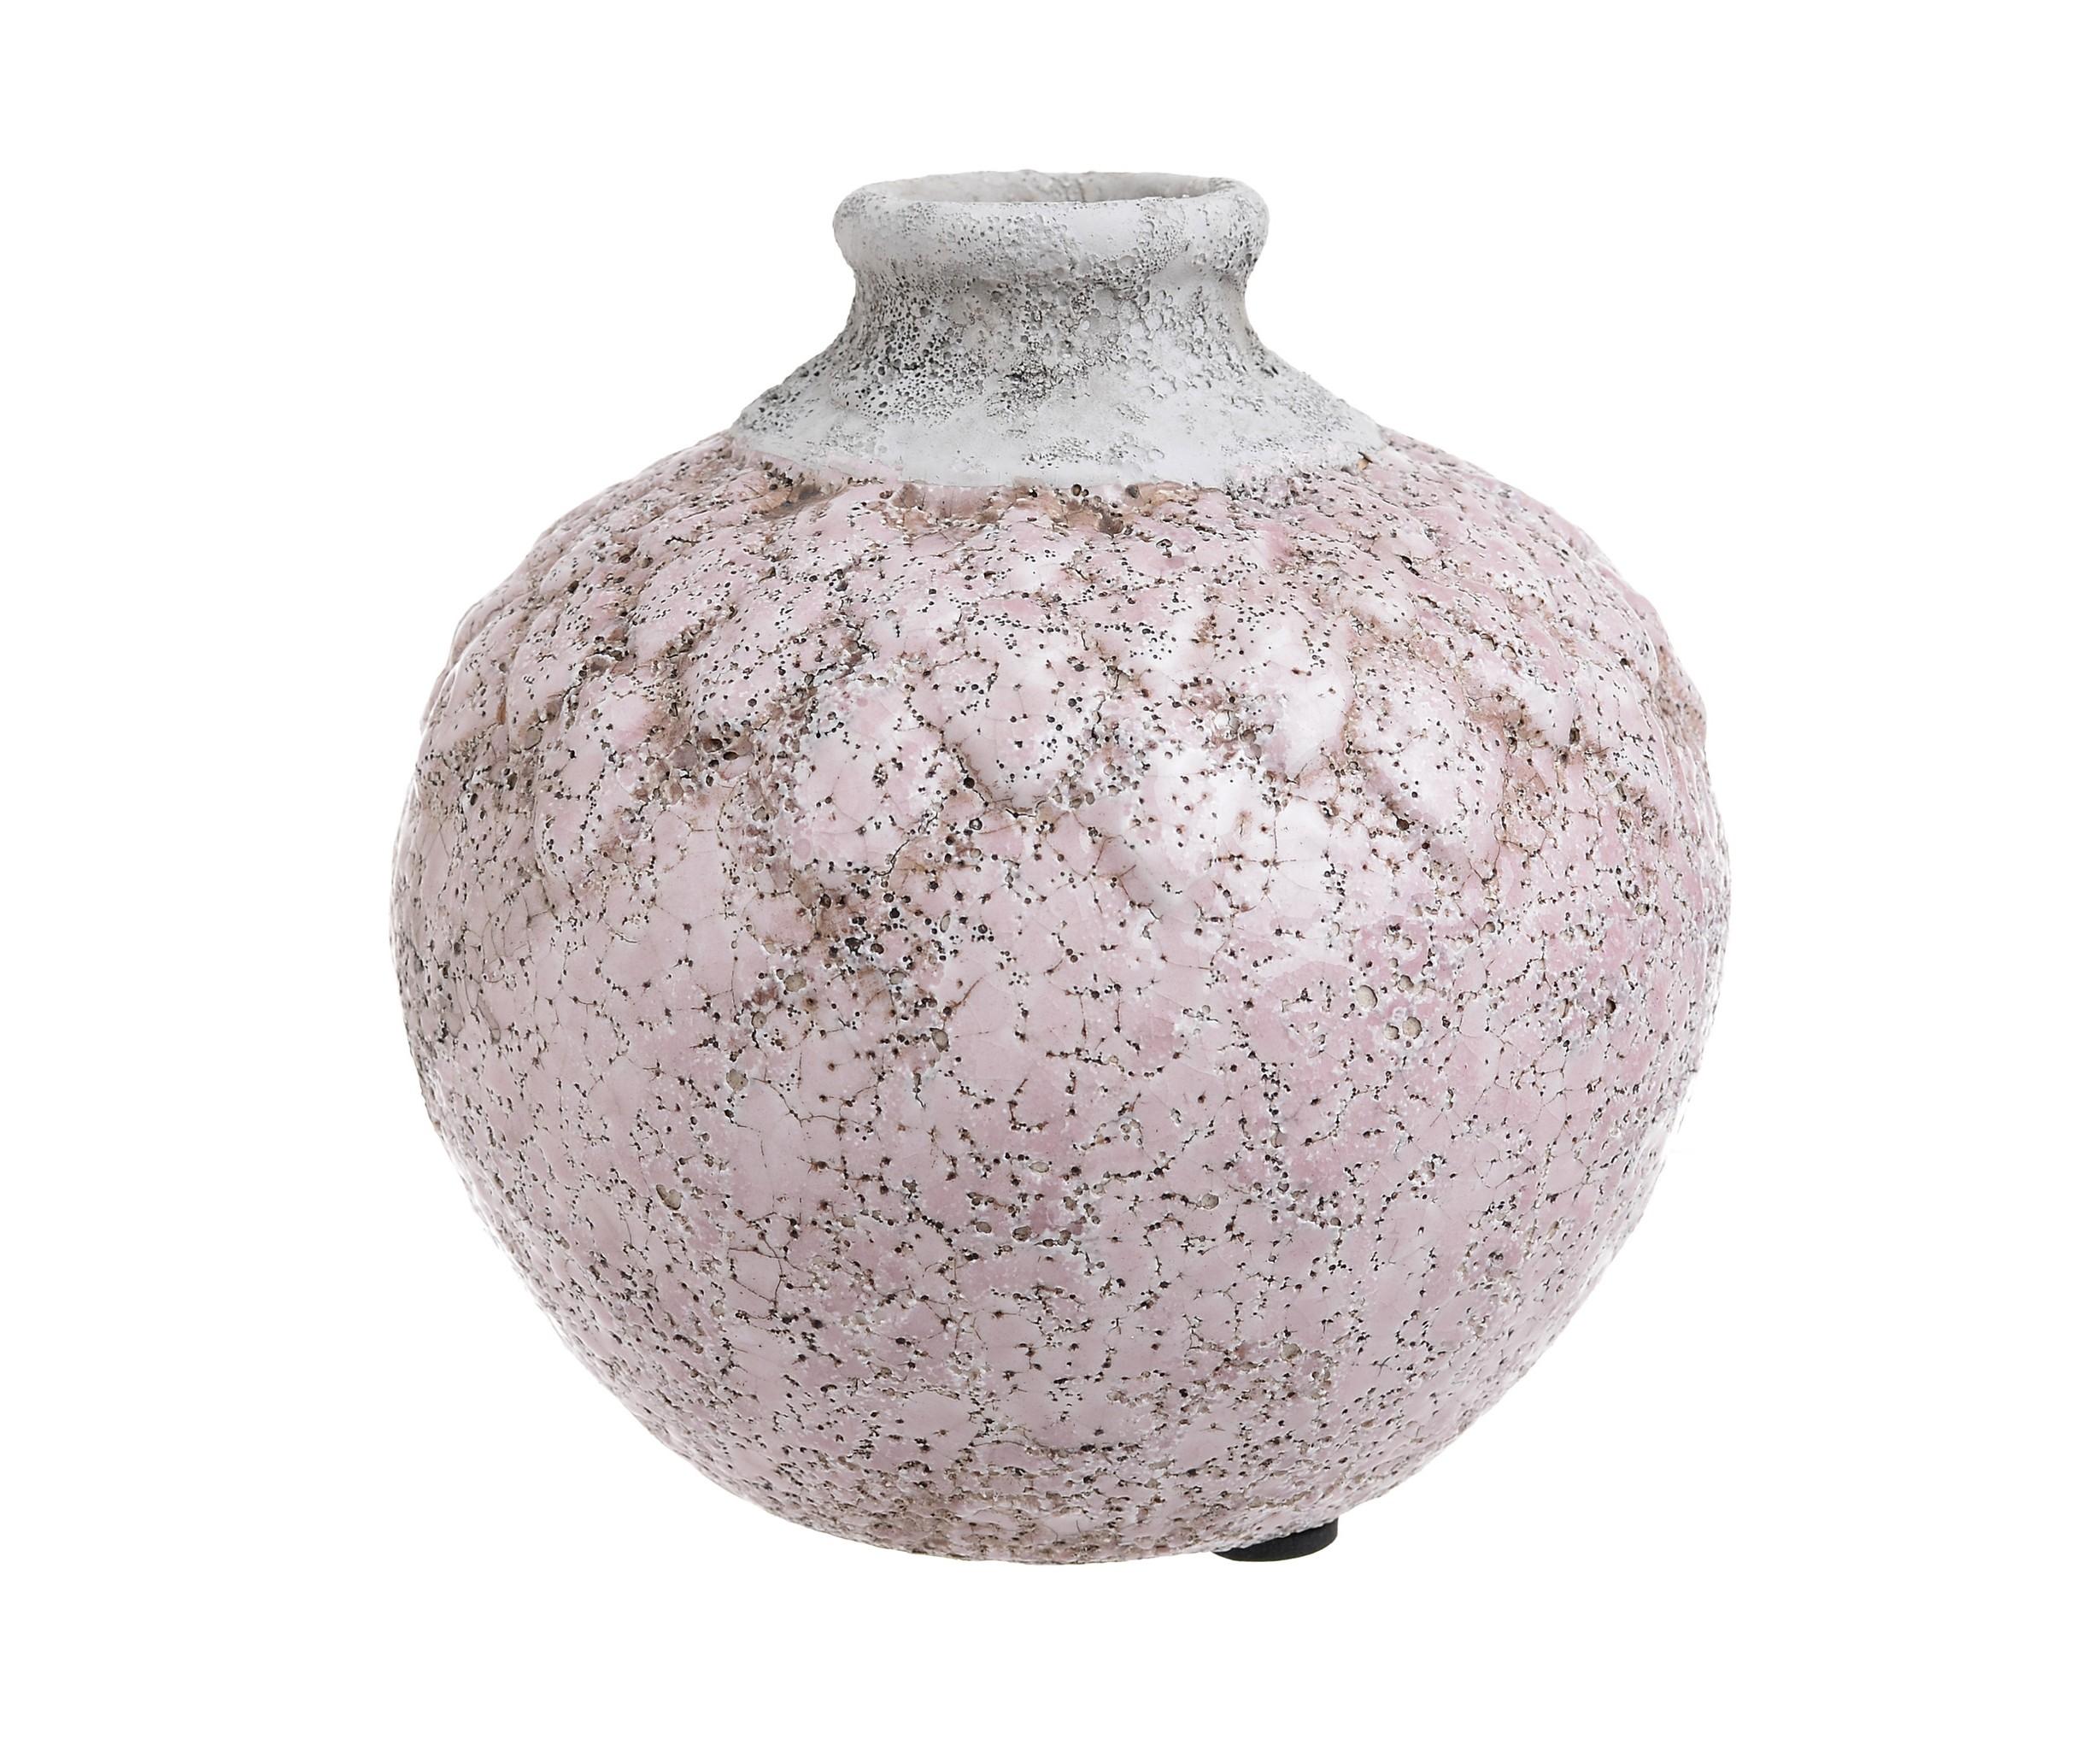 Декоративная ваза To4rooms 4166751 от thefurnish